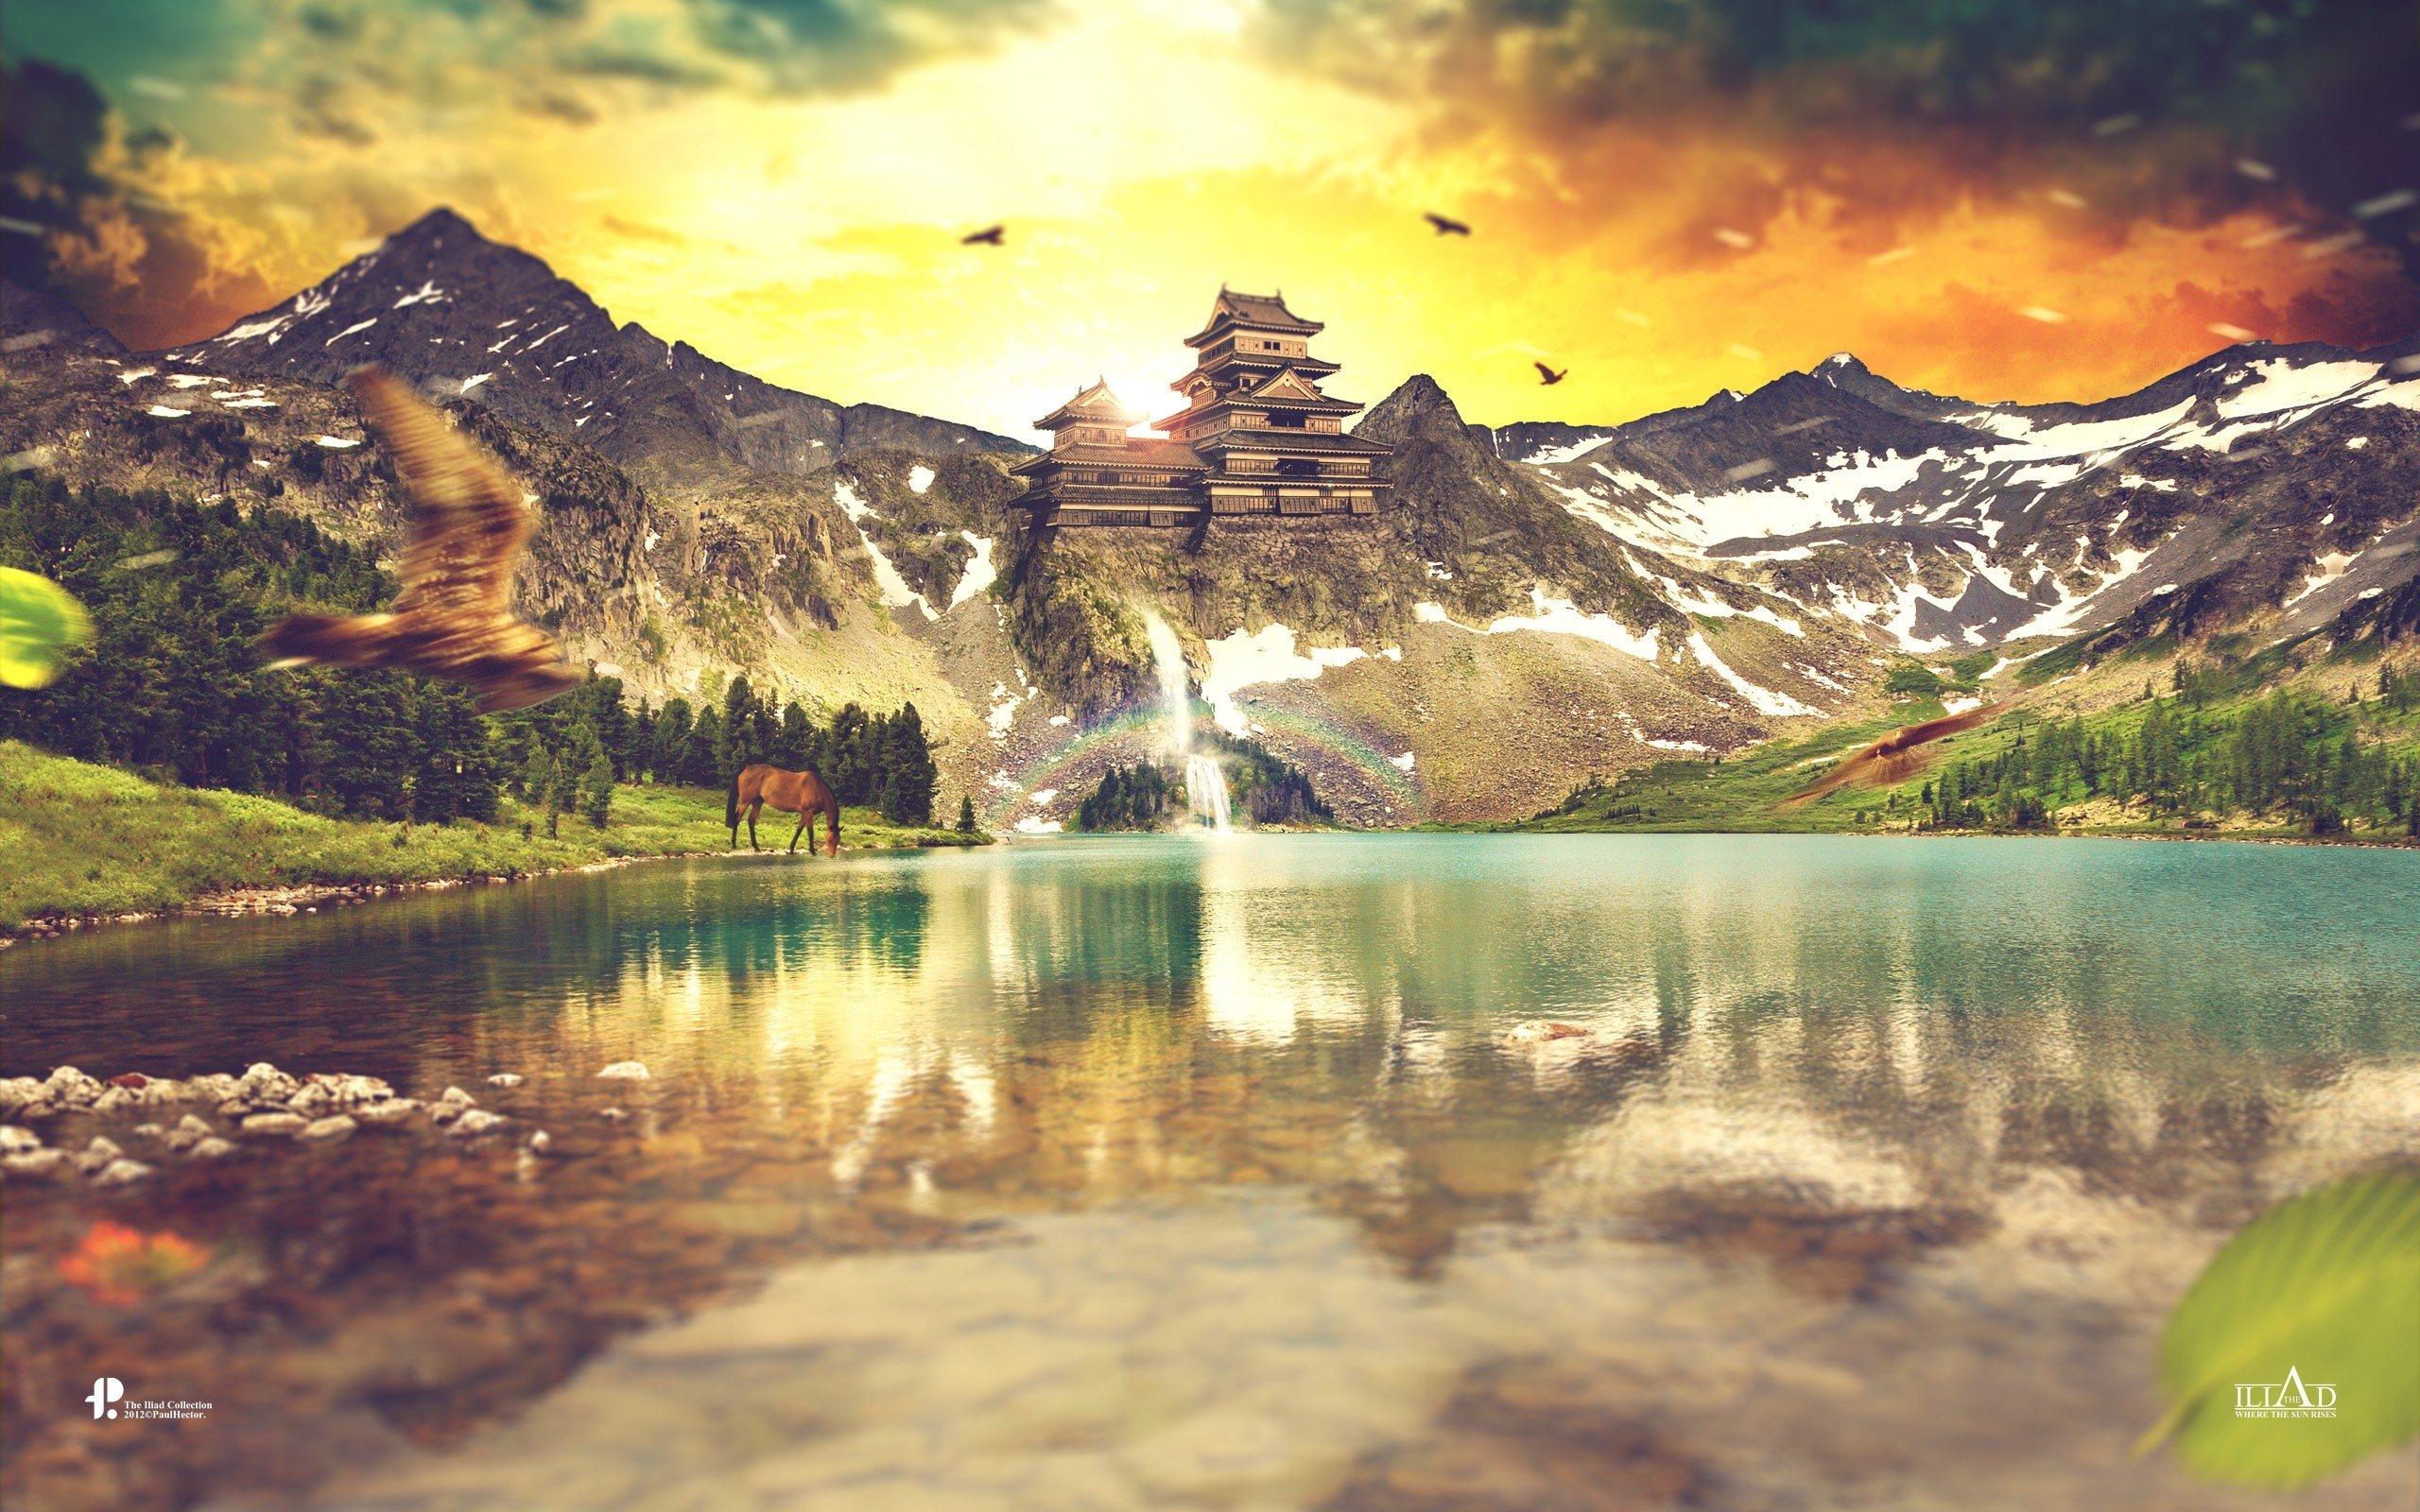 Fondos de pantalla Montañas reflejándose en las montañas